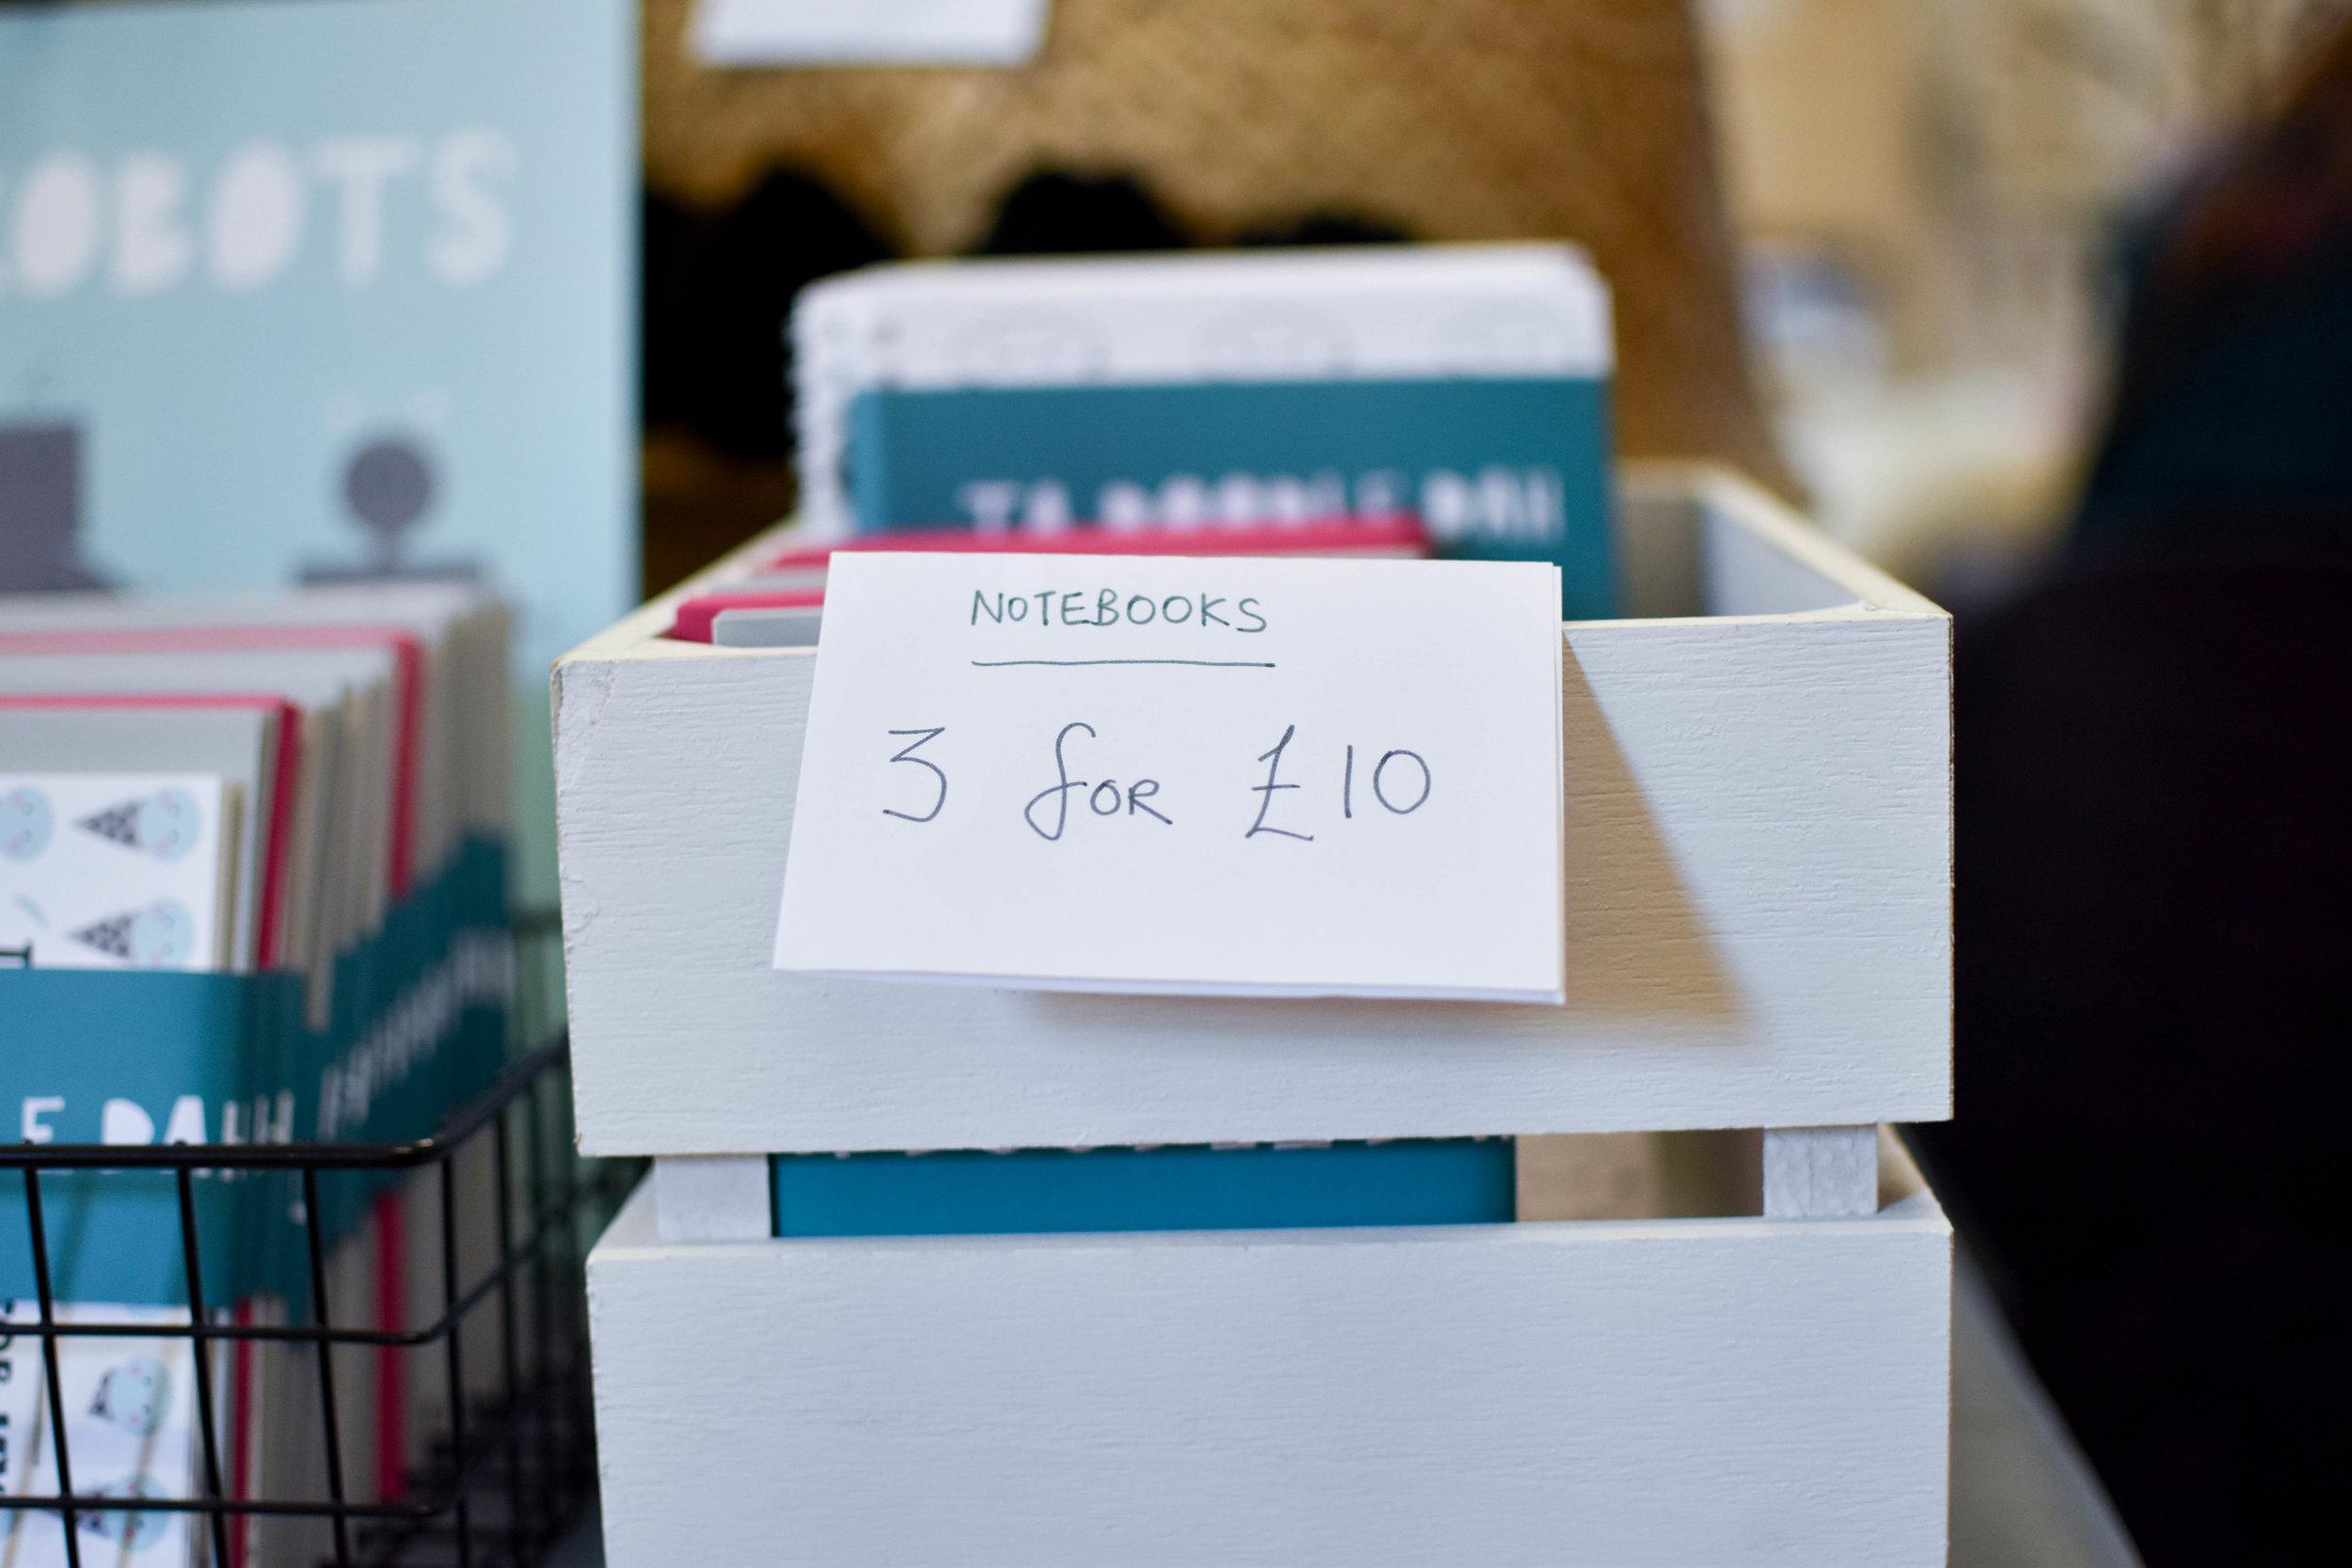 support-local-pop-up-market-fair-shopping-kent-whitstable.jpg7.jpg